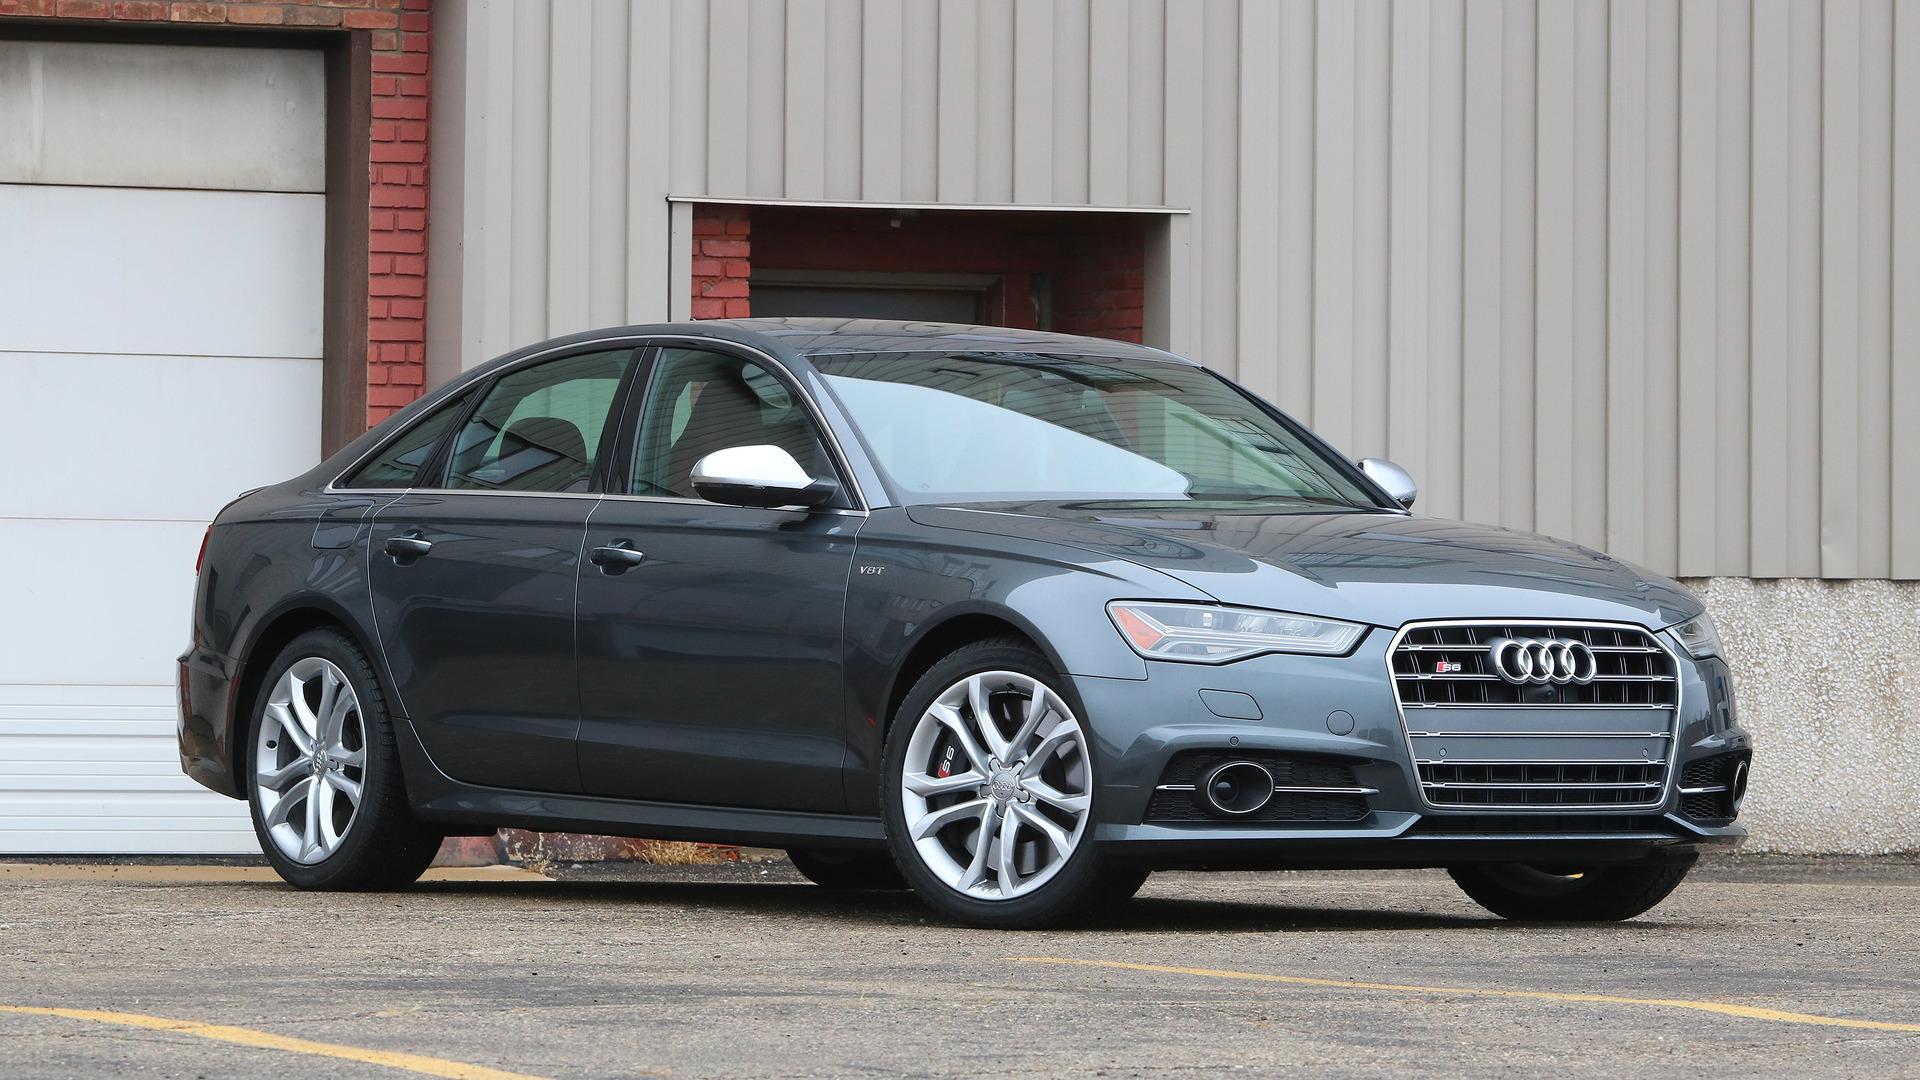 Audi Rs New Car Models - Audi rs7 0 60